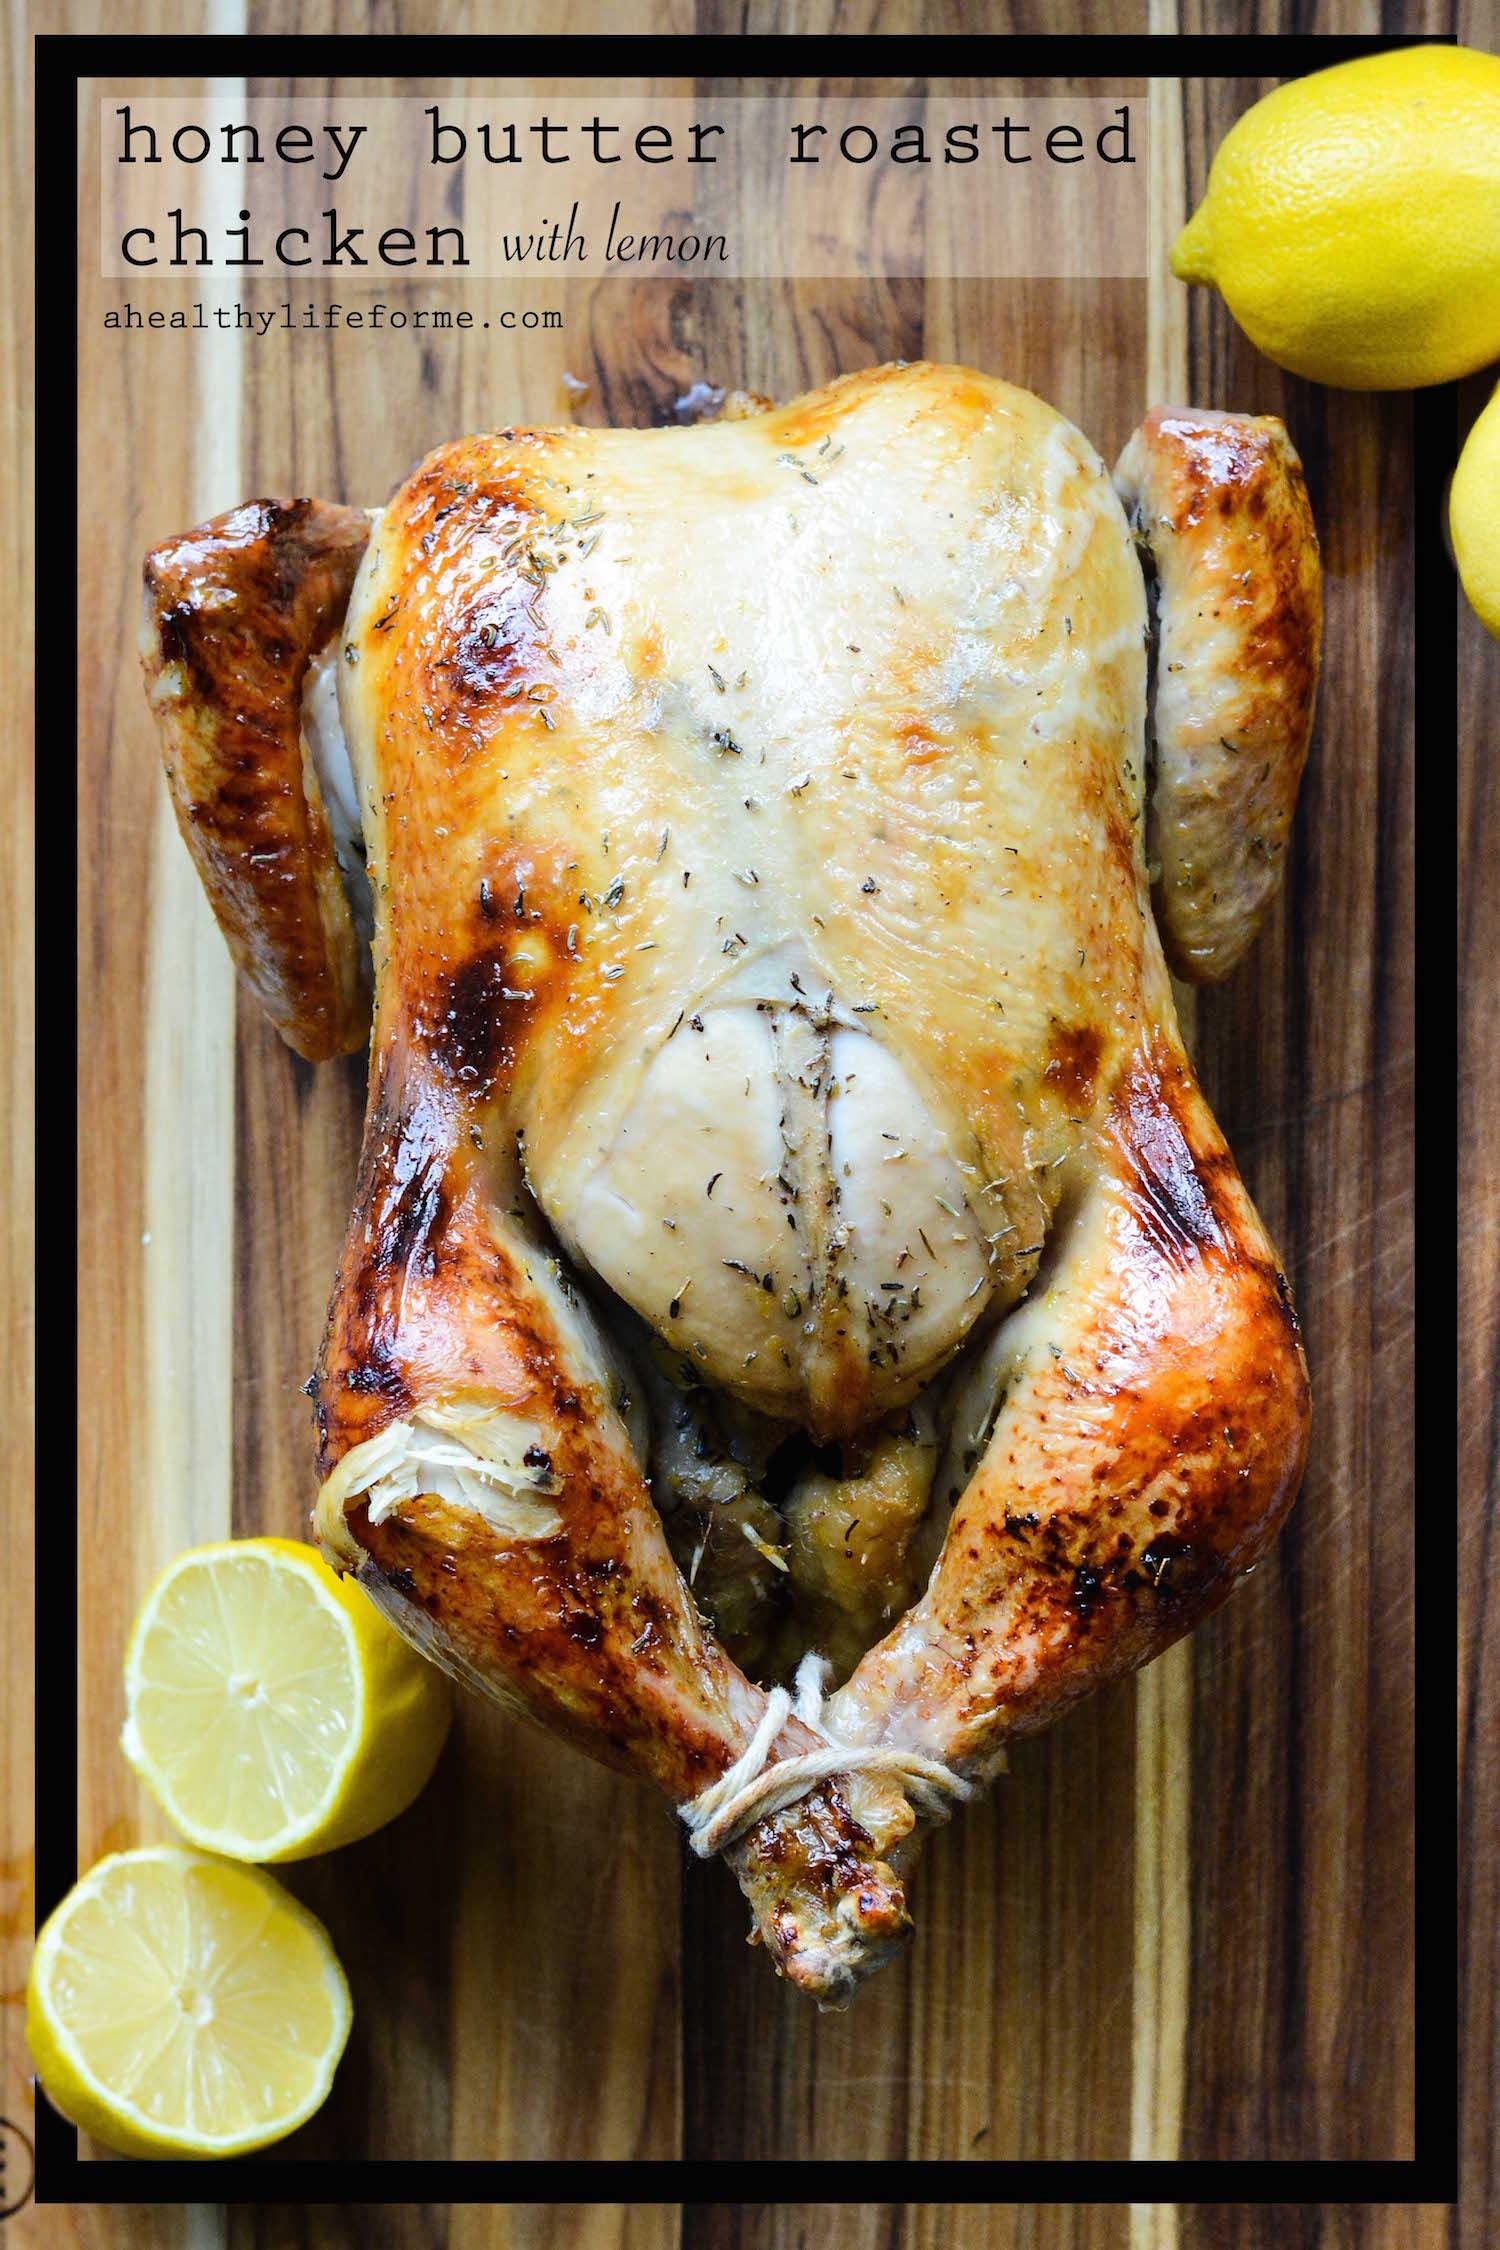 Honey Butter Roasted Chicken with Lemon